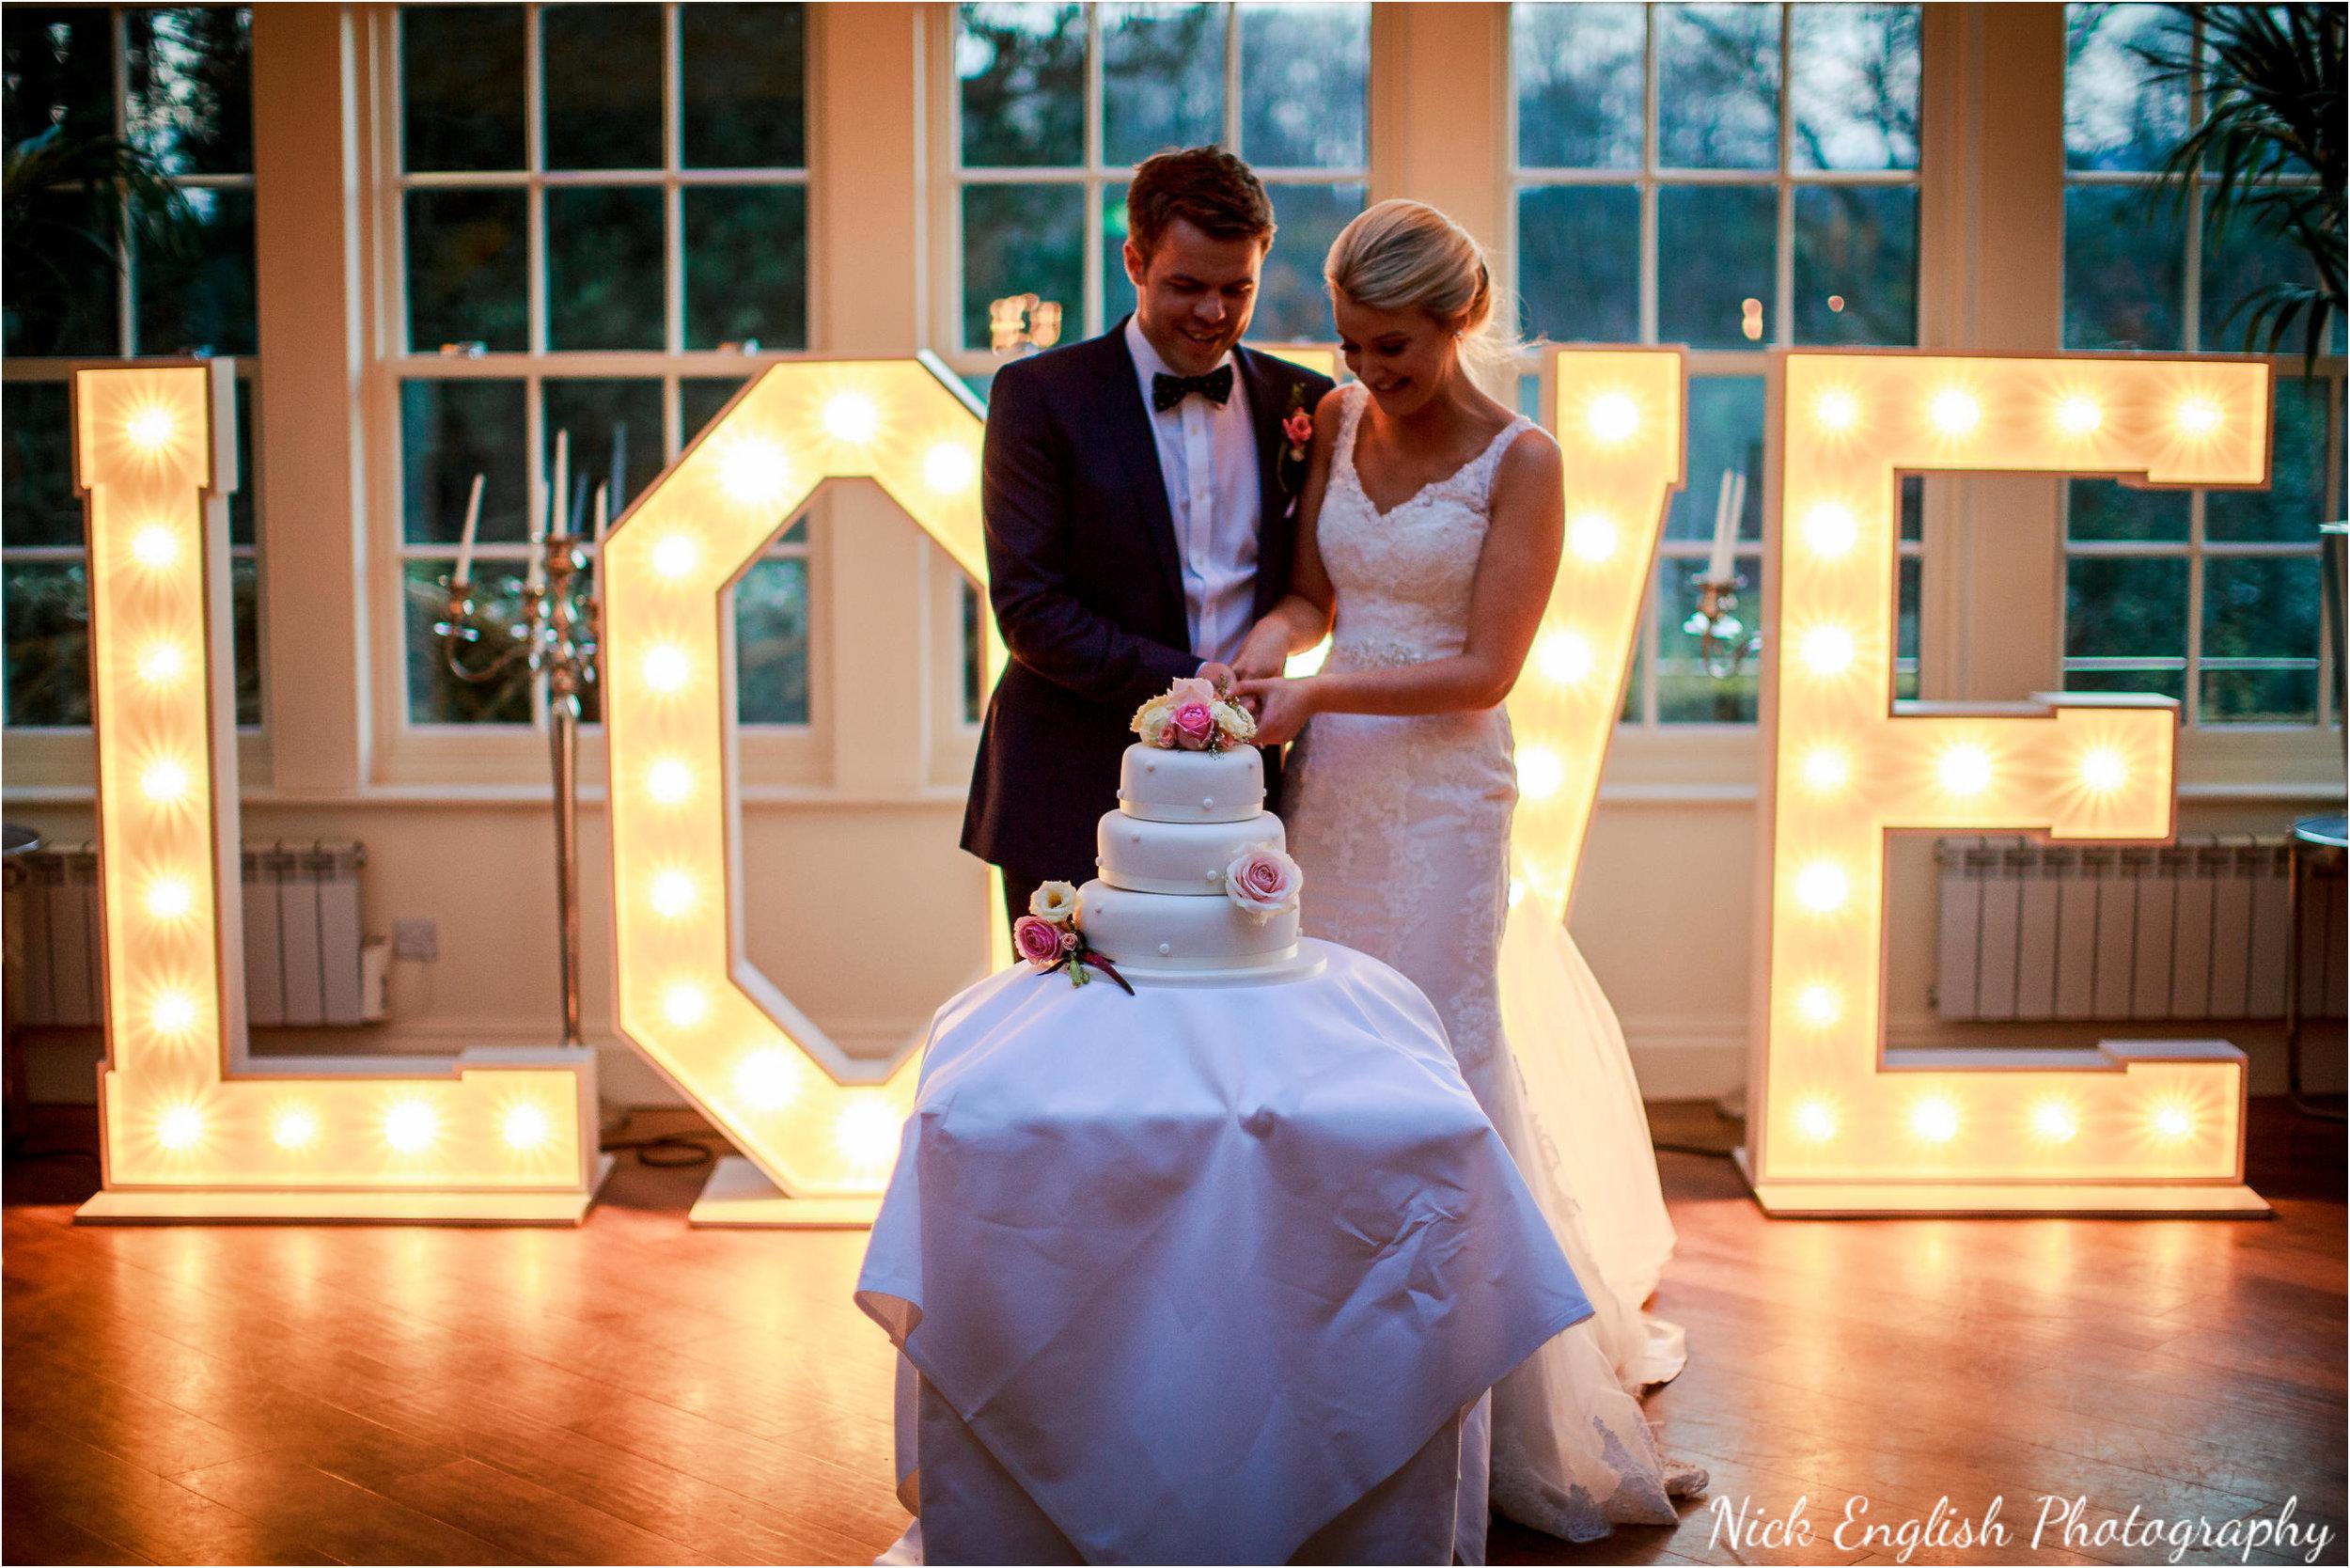 Mitton Hall Bride Groom Cake Cutting